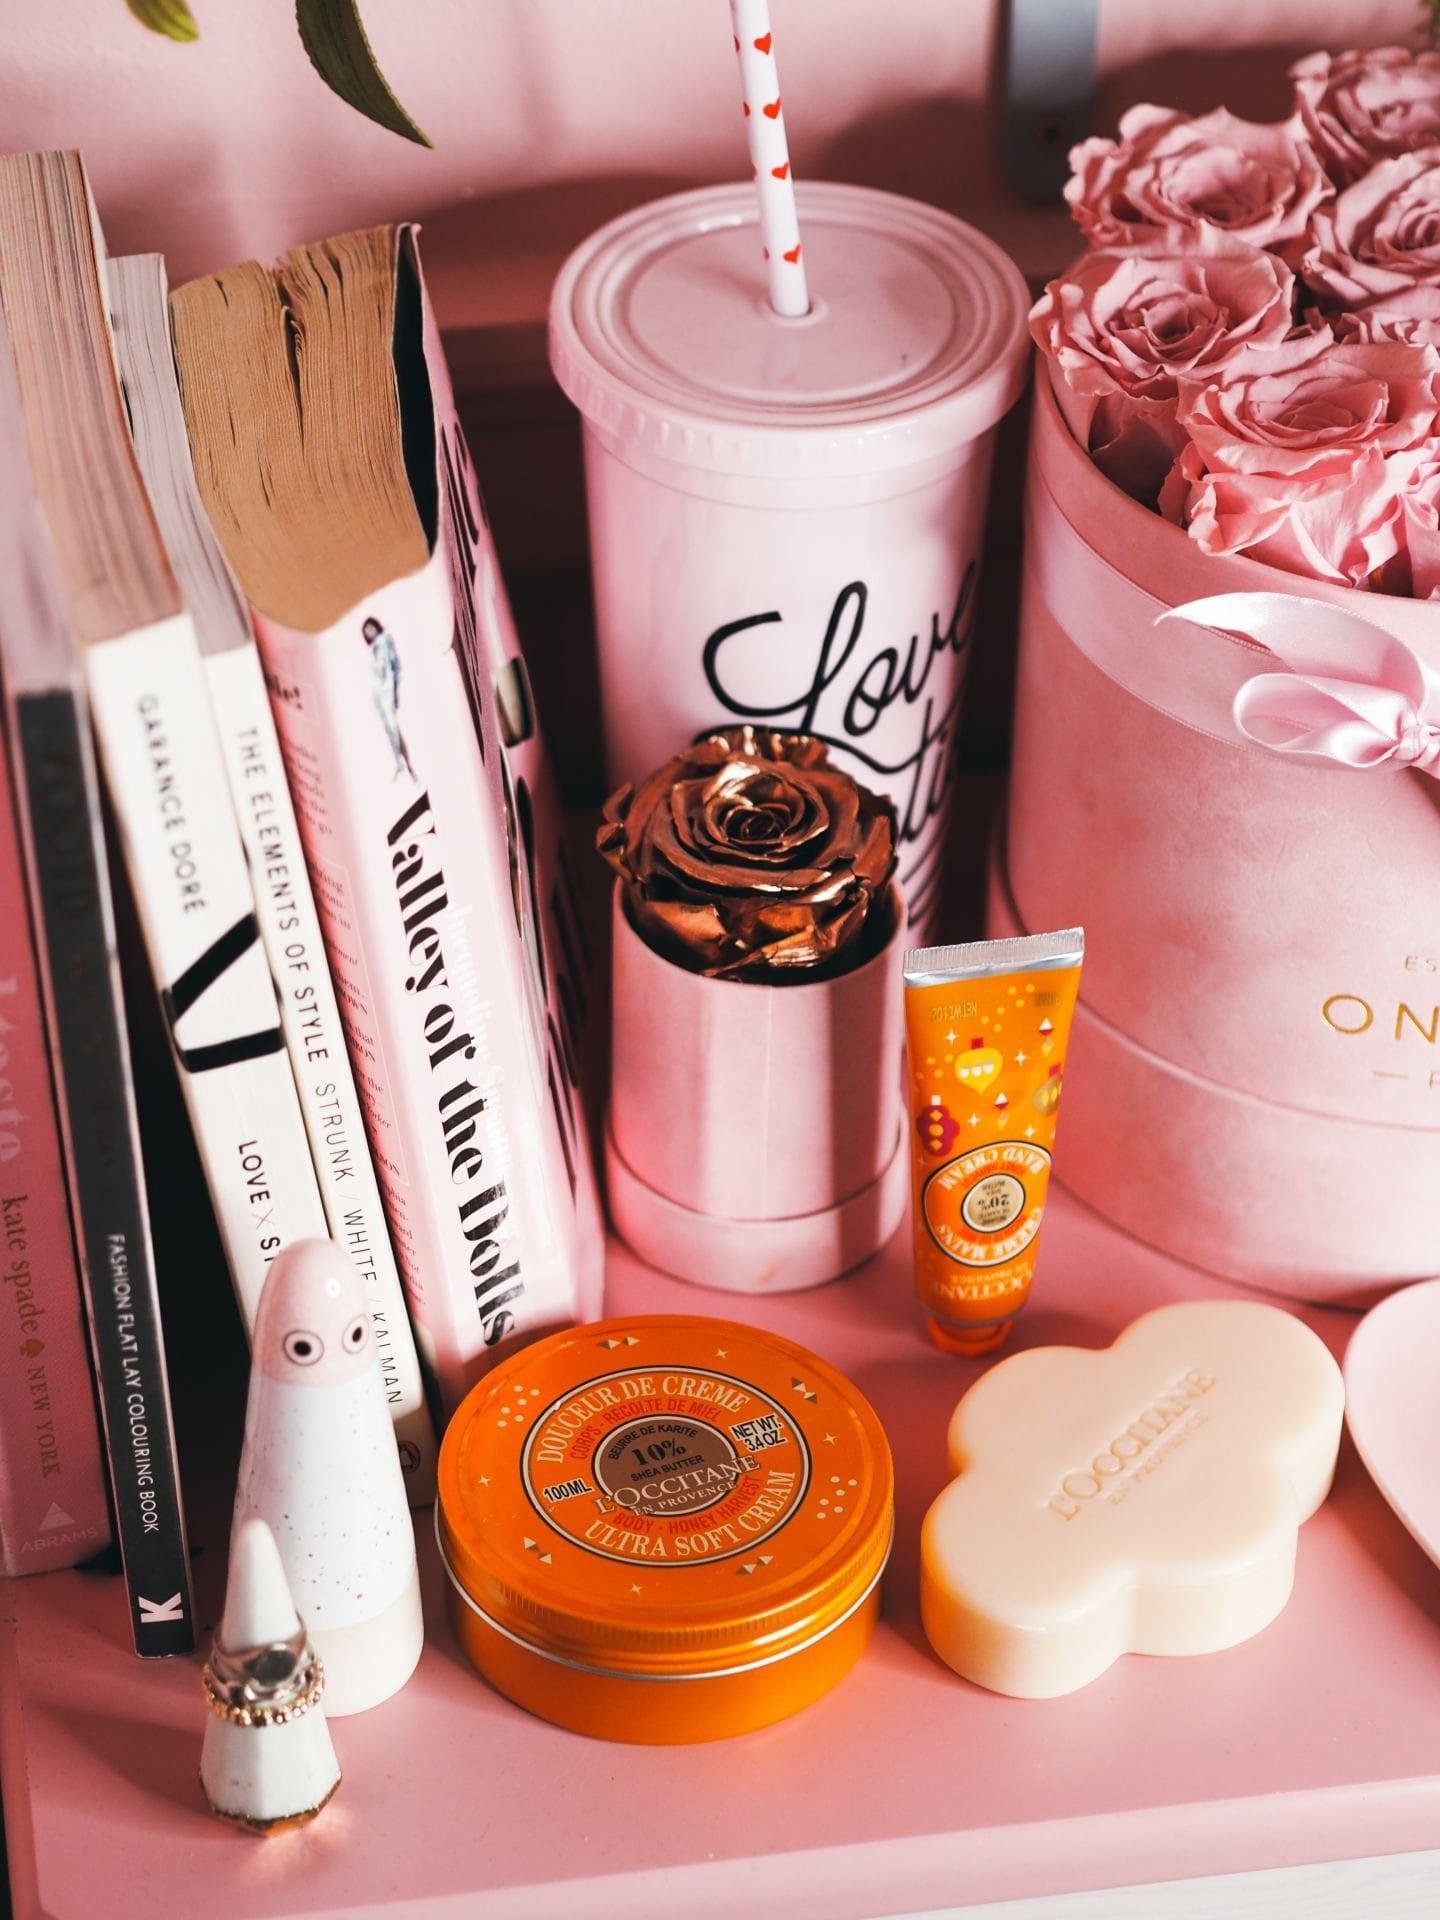 L'Occitane 'Honey Harvest' collection